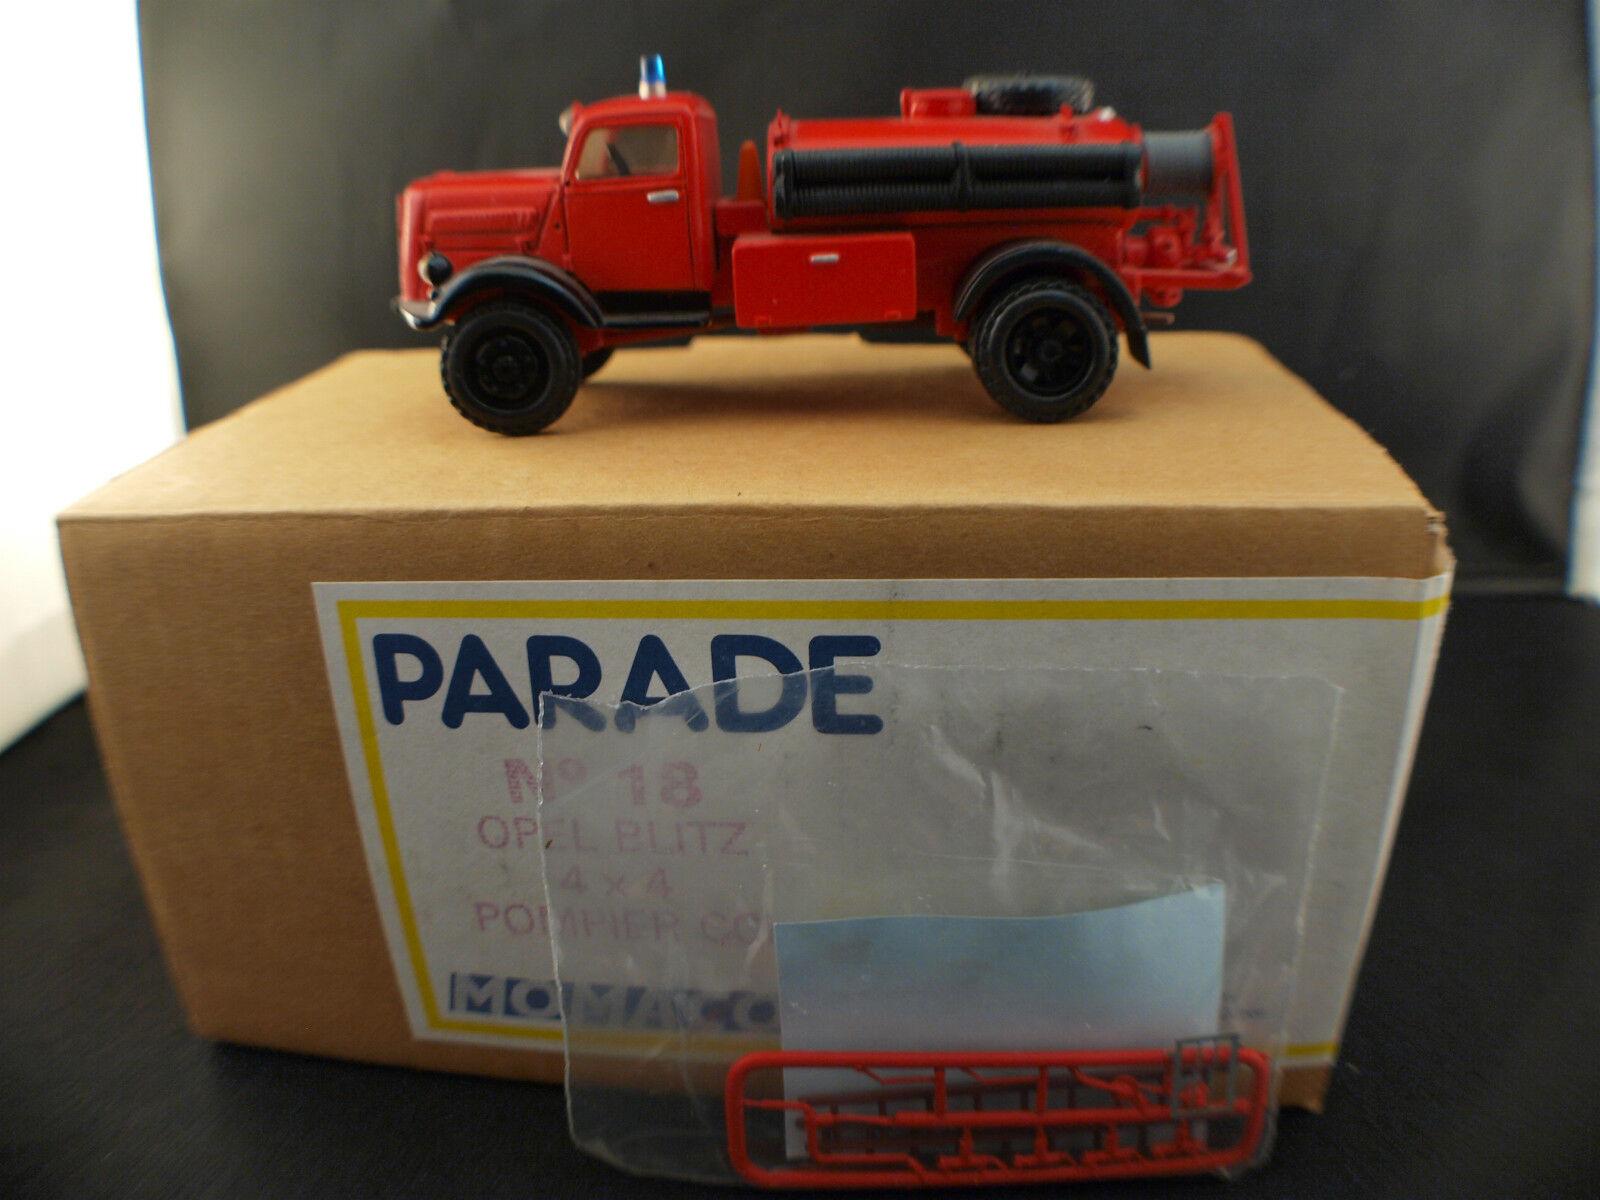 PARADE n° 18 Opel Blitz 4x4 Fourgon pompiers boite neuf 1 50